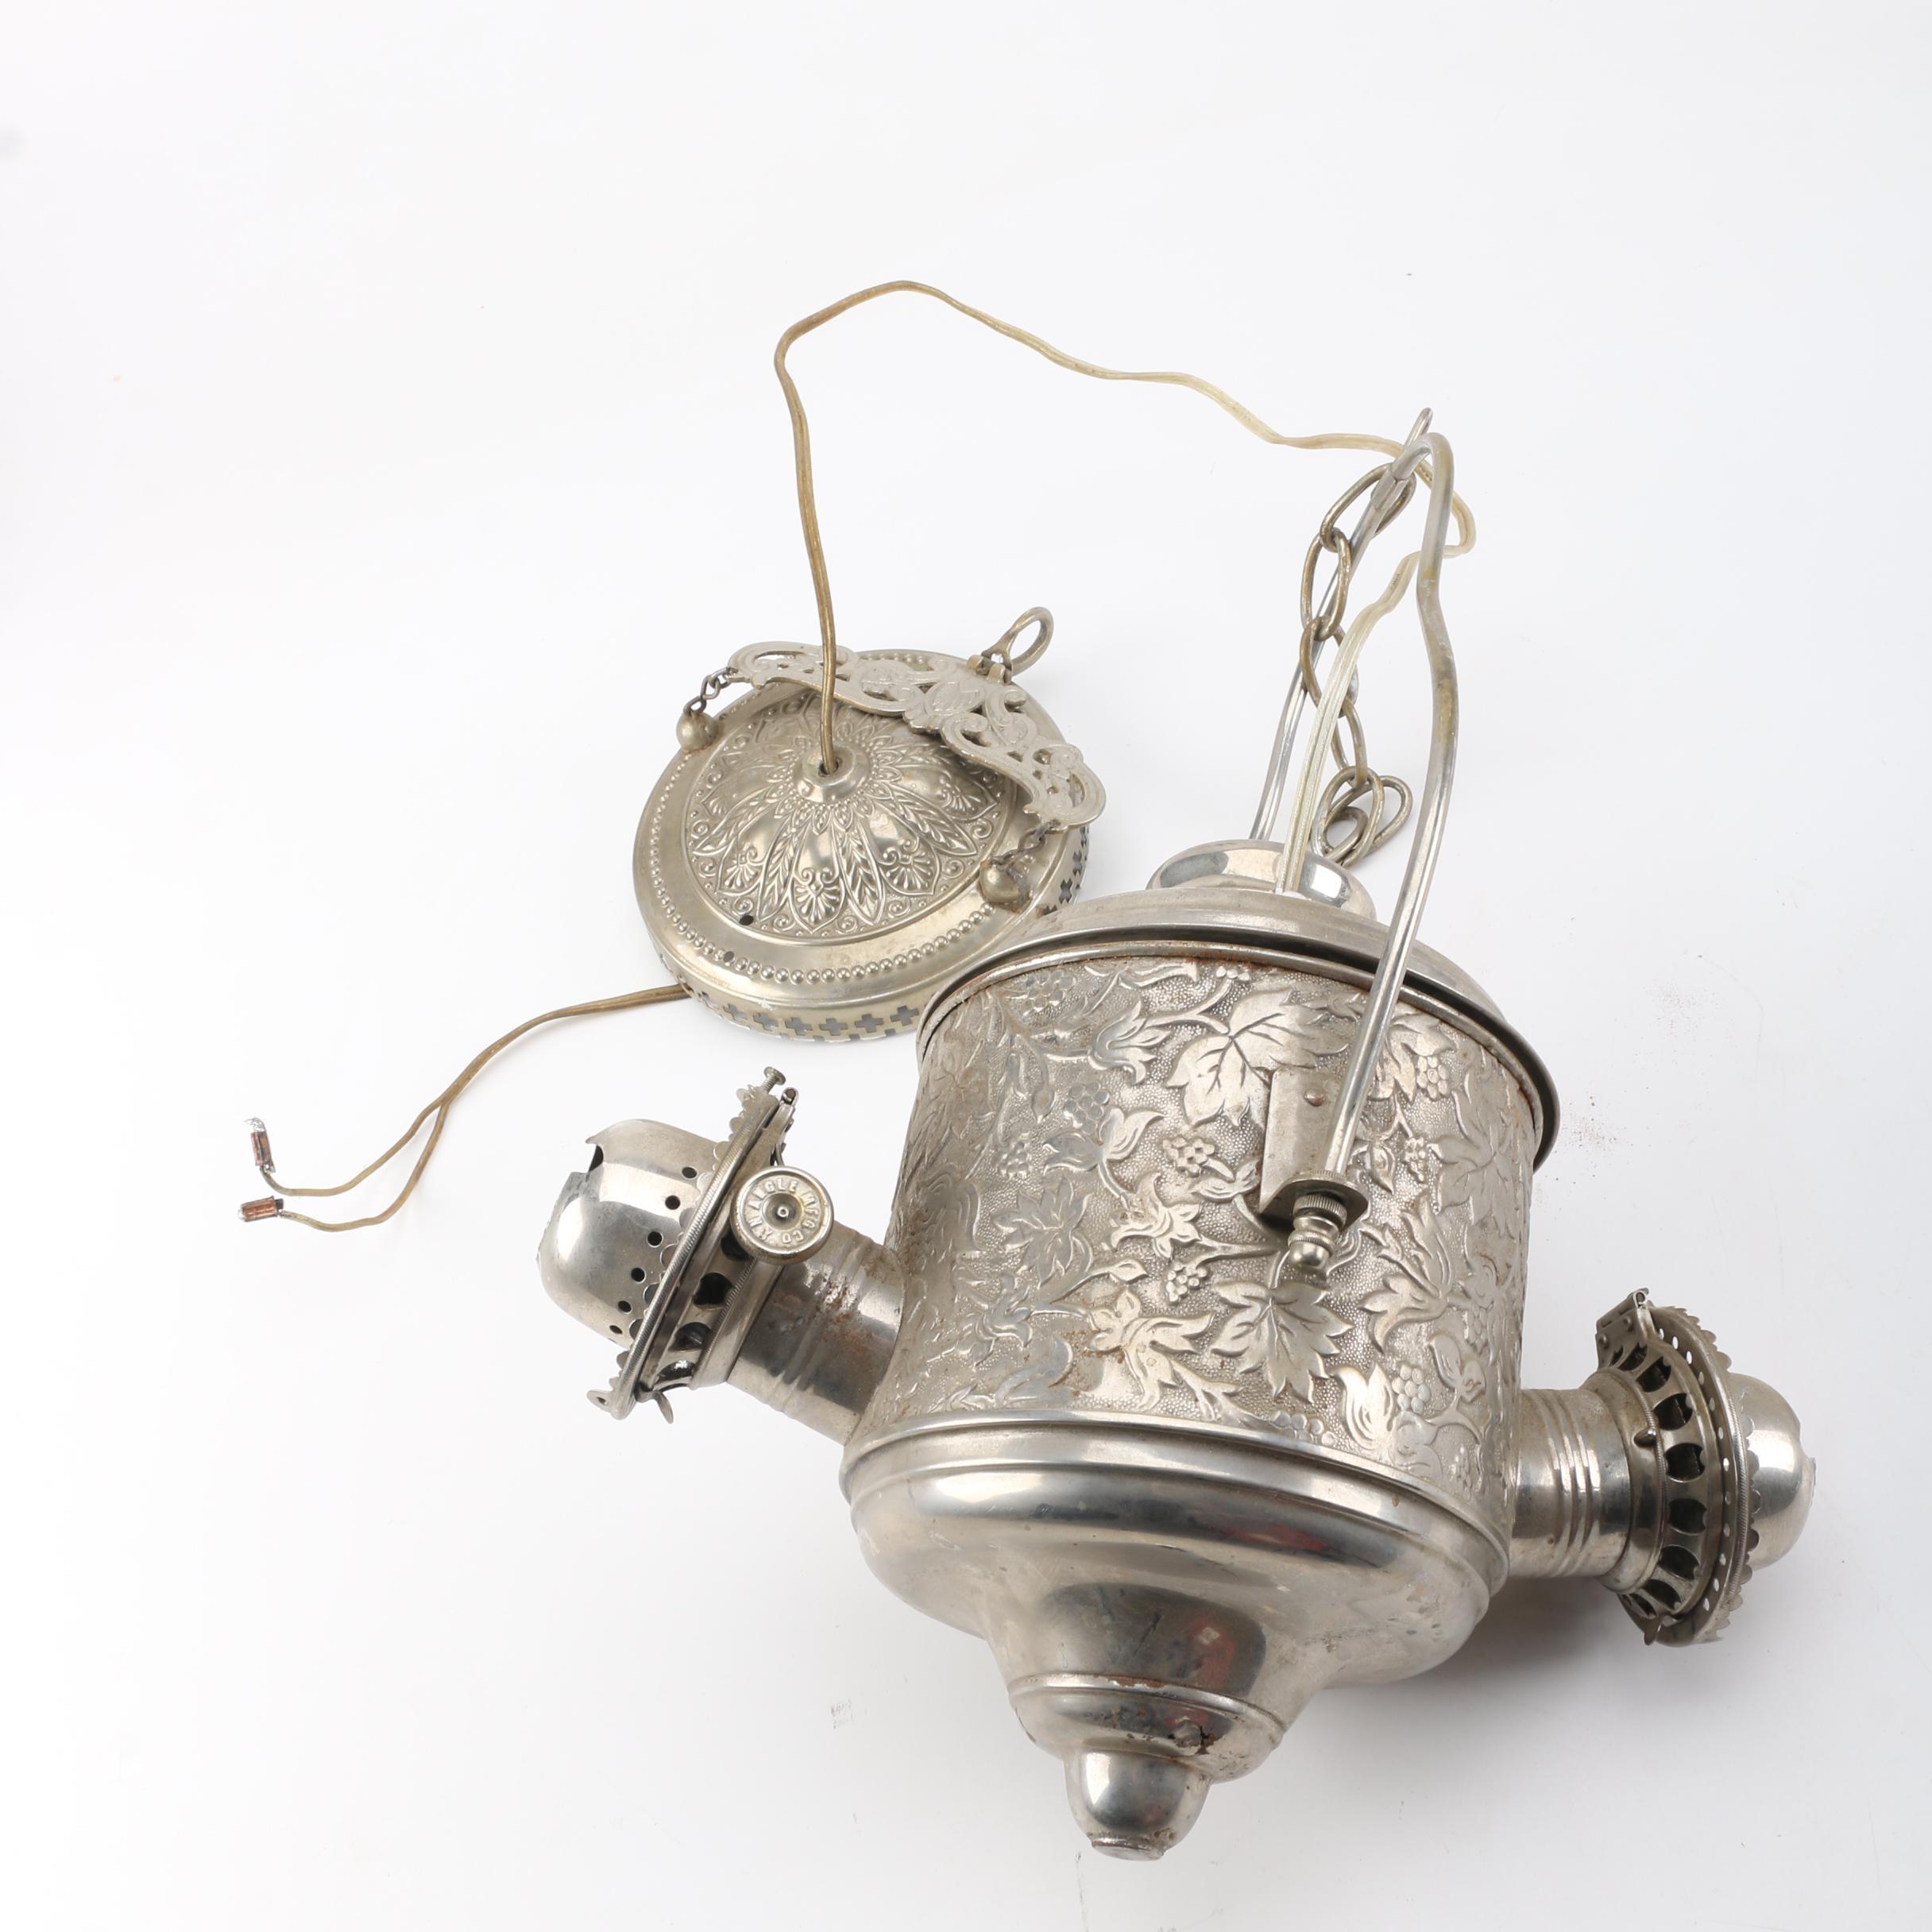 Converted Antique Two Burner Hanging Oil Lamp